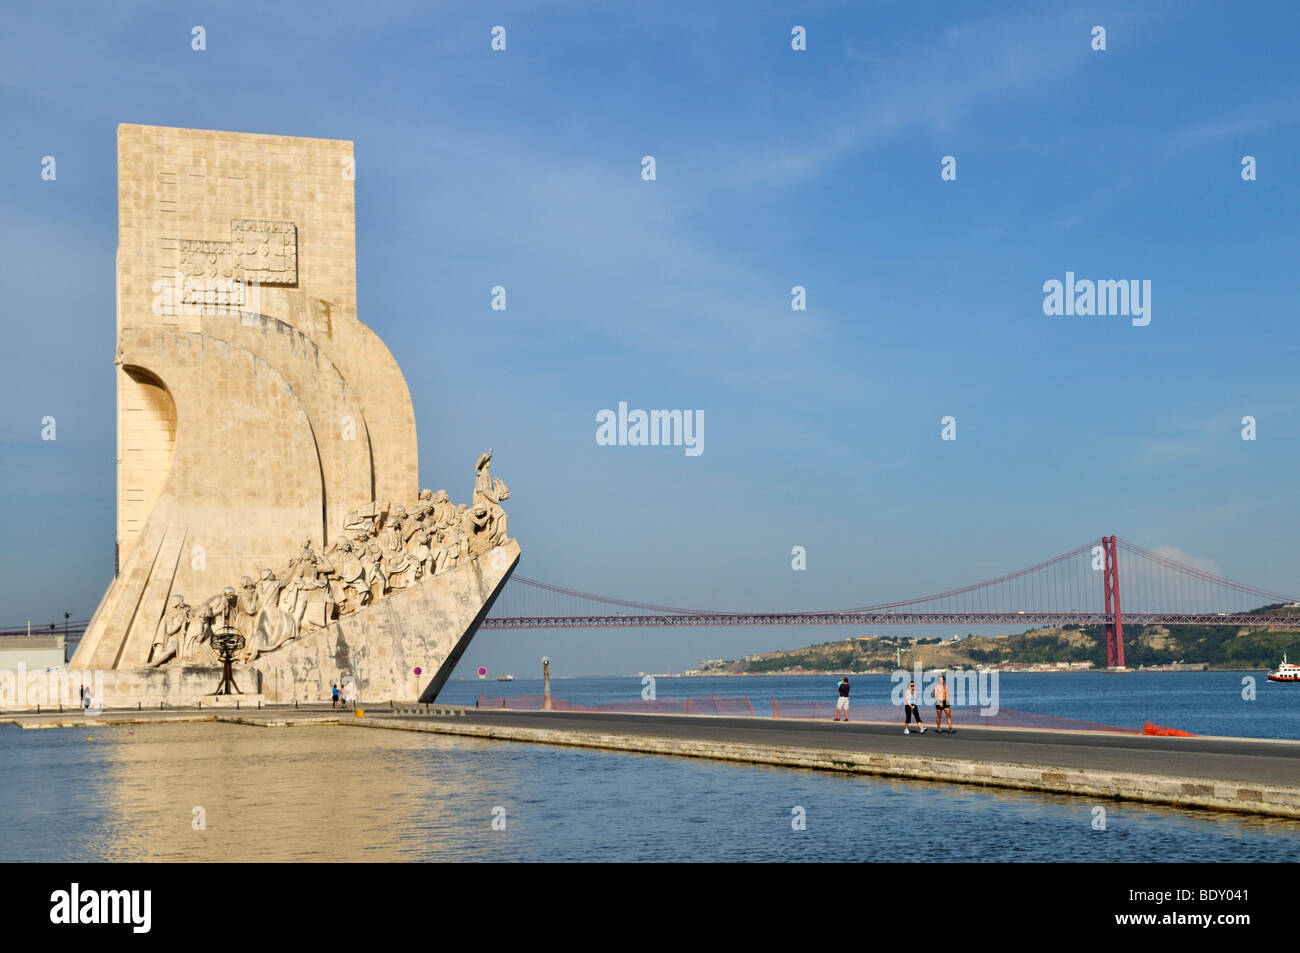 Monument to the Discoveries, Padrao dos Descobrimentos, on the estuary of the Tagus river, bridge Ponte 25 de Abril - Stock Image